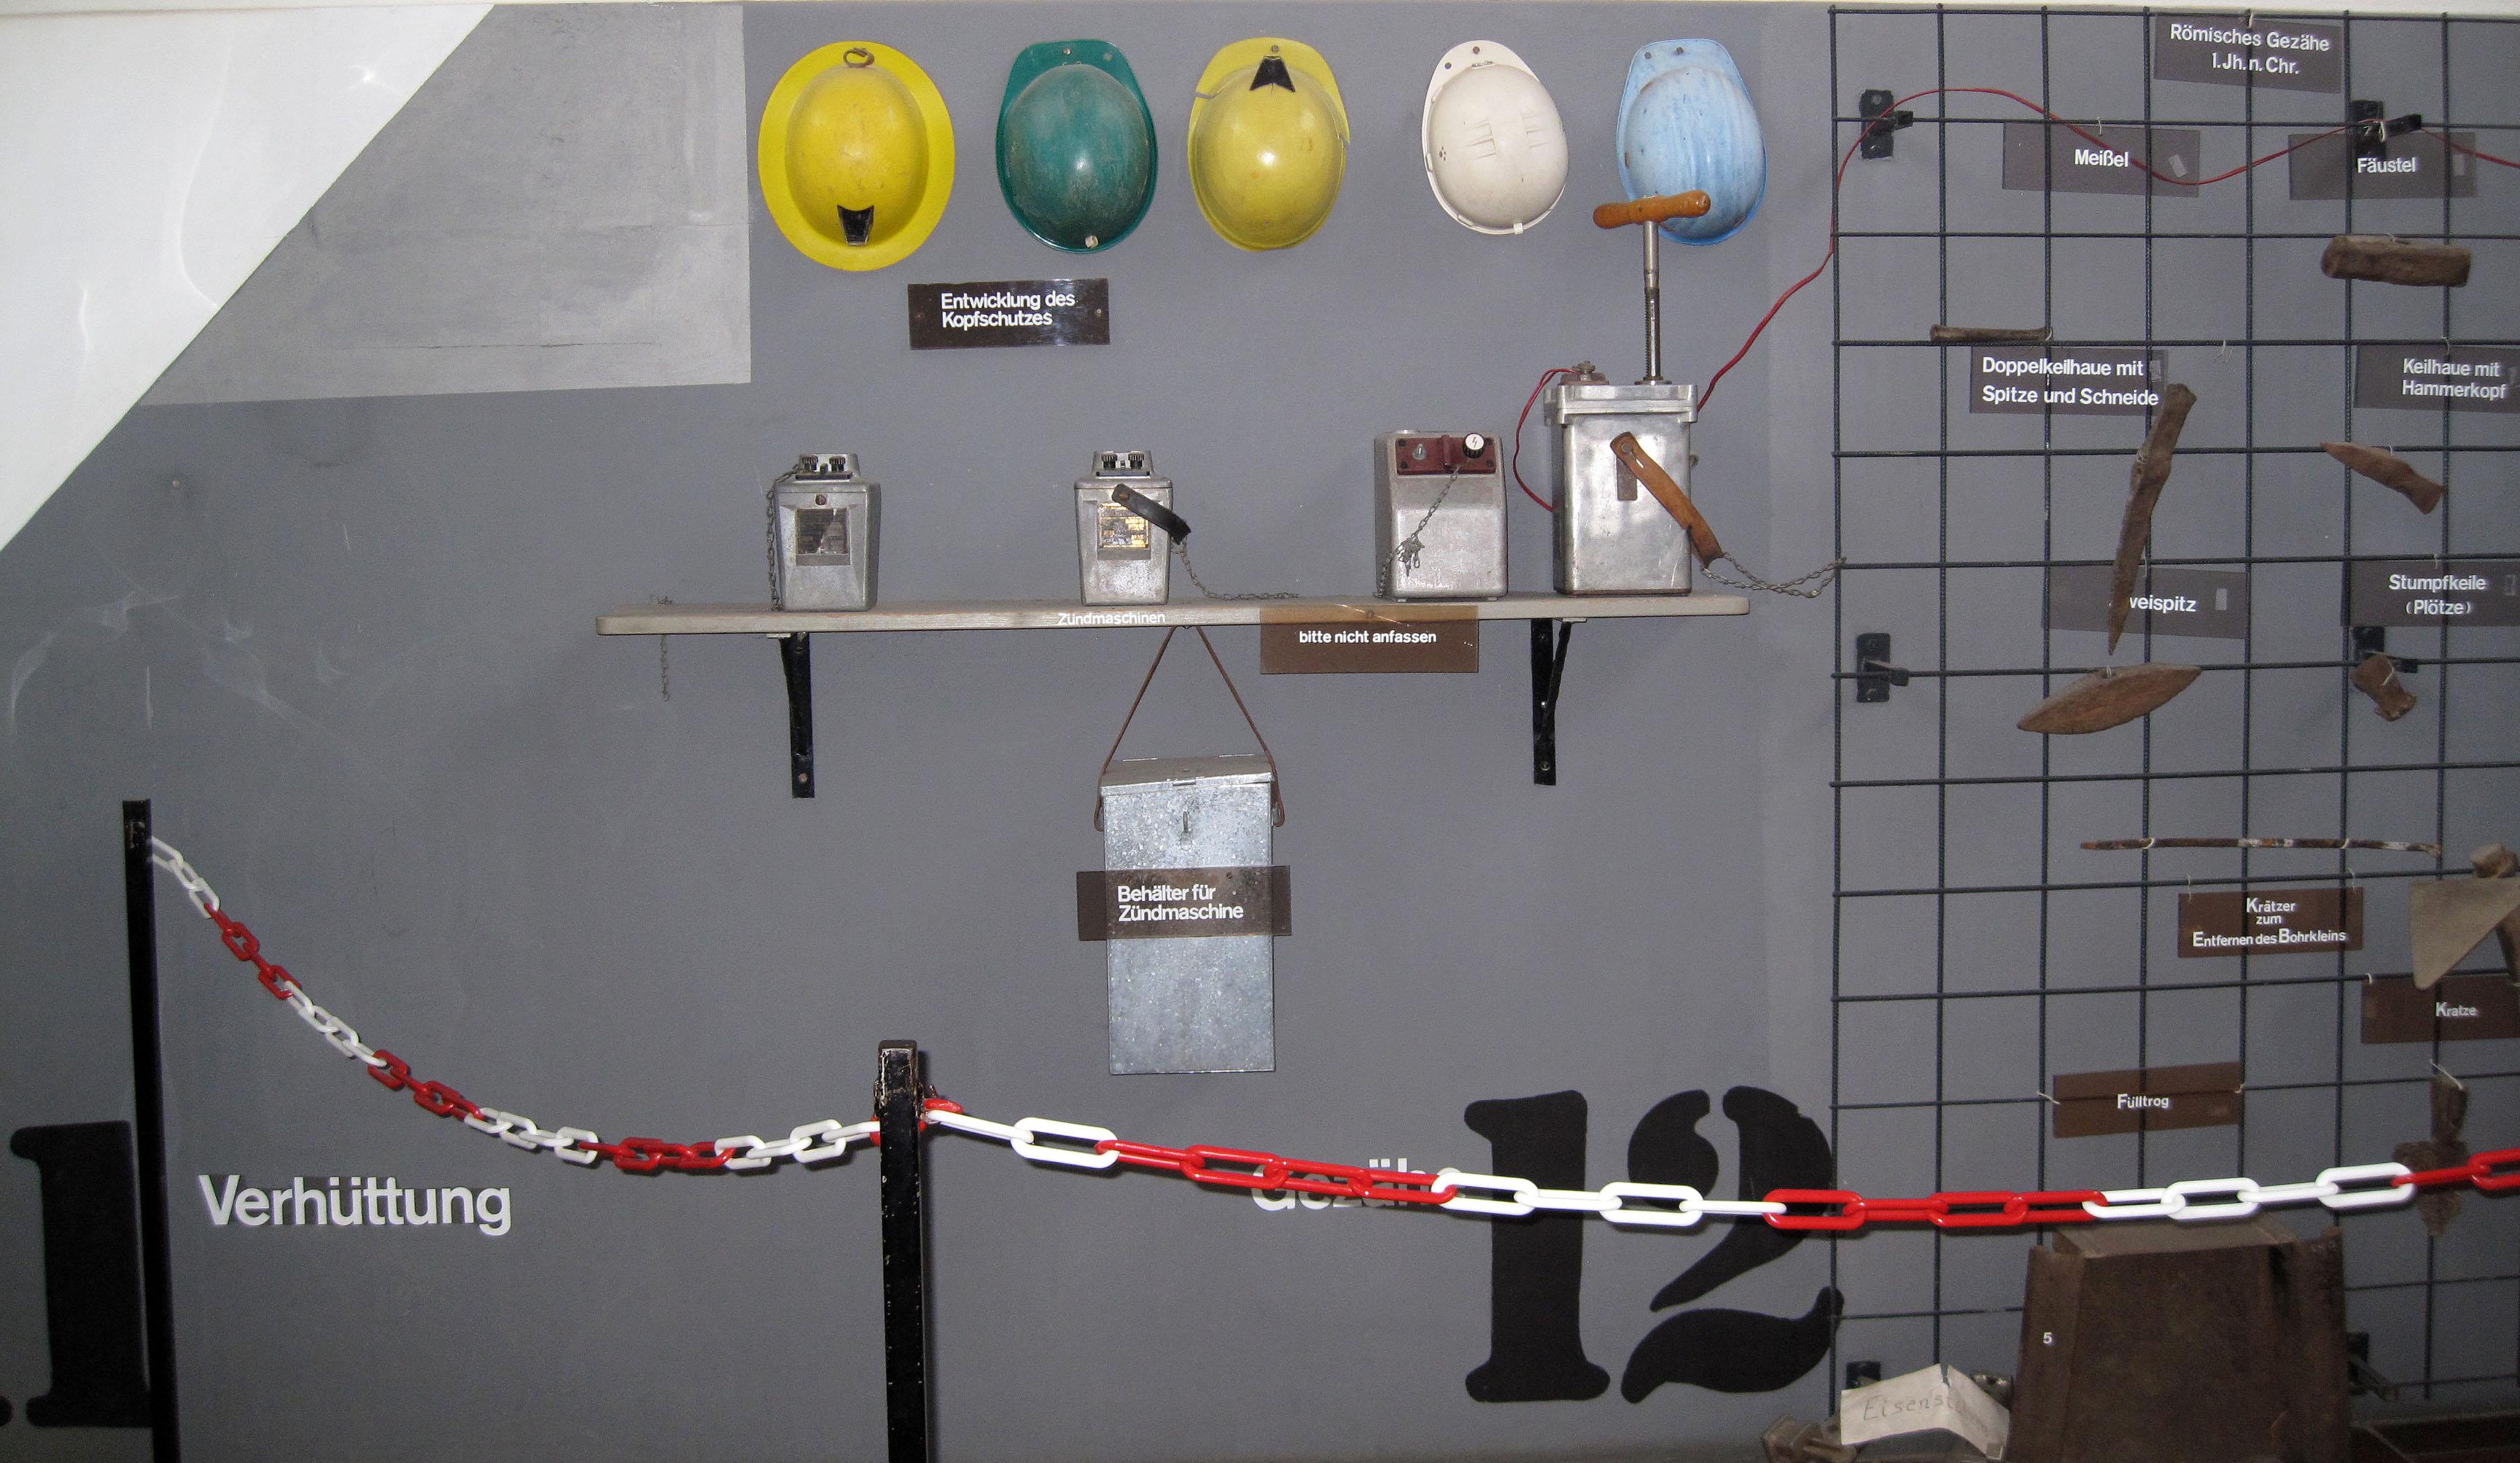 file:ramsbeck, bergbaumuseum, werkzeugwand 1 - wikimedia commons